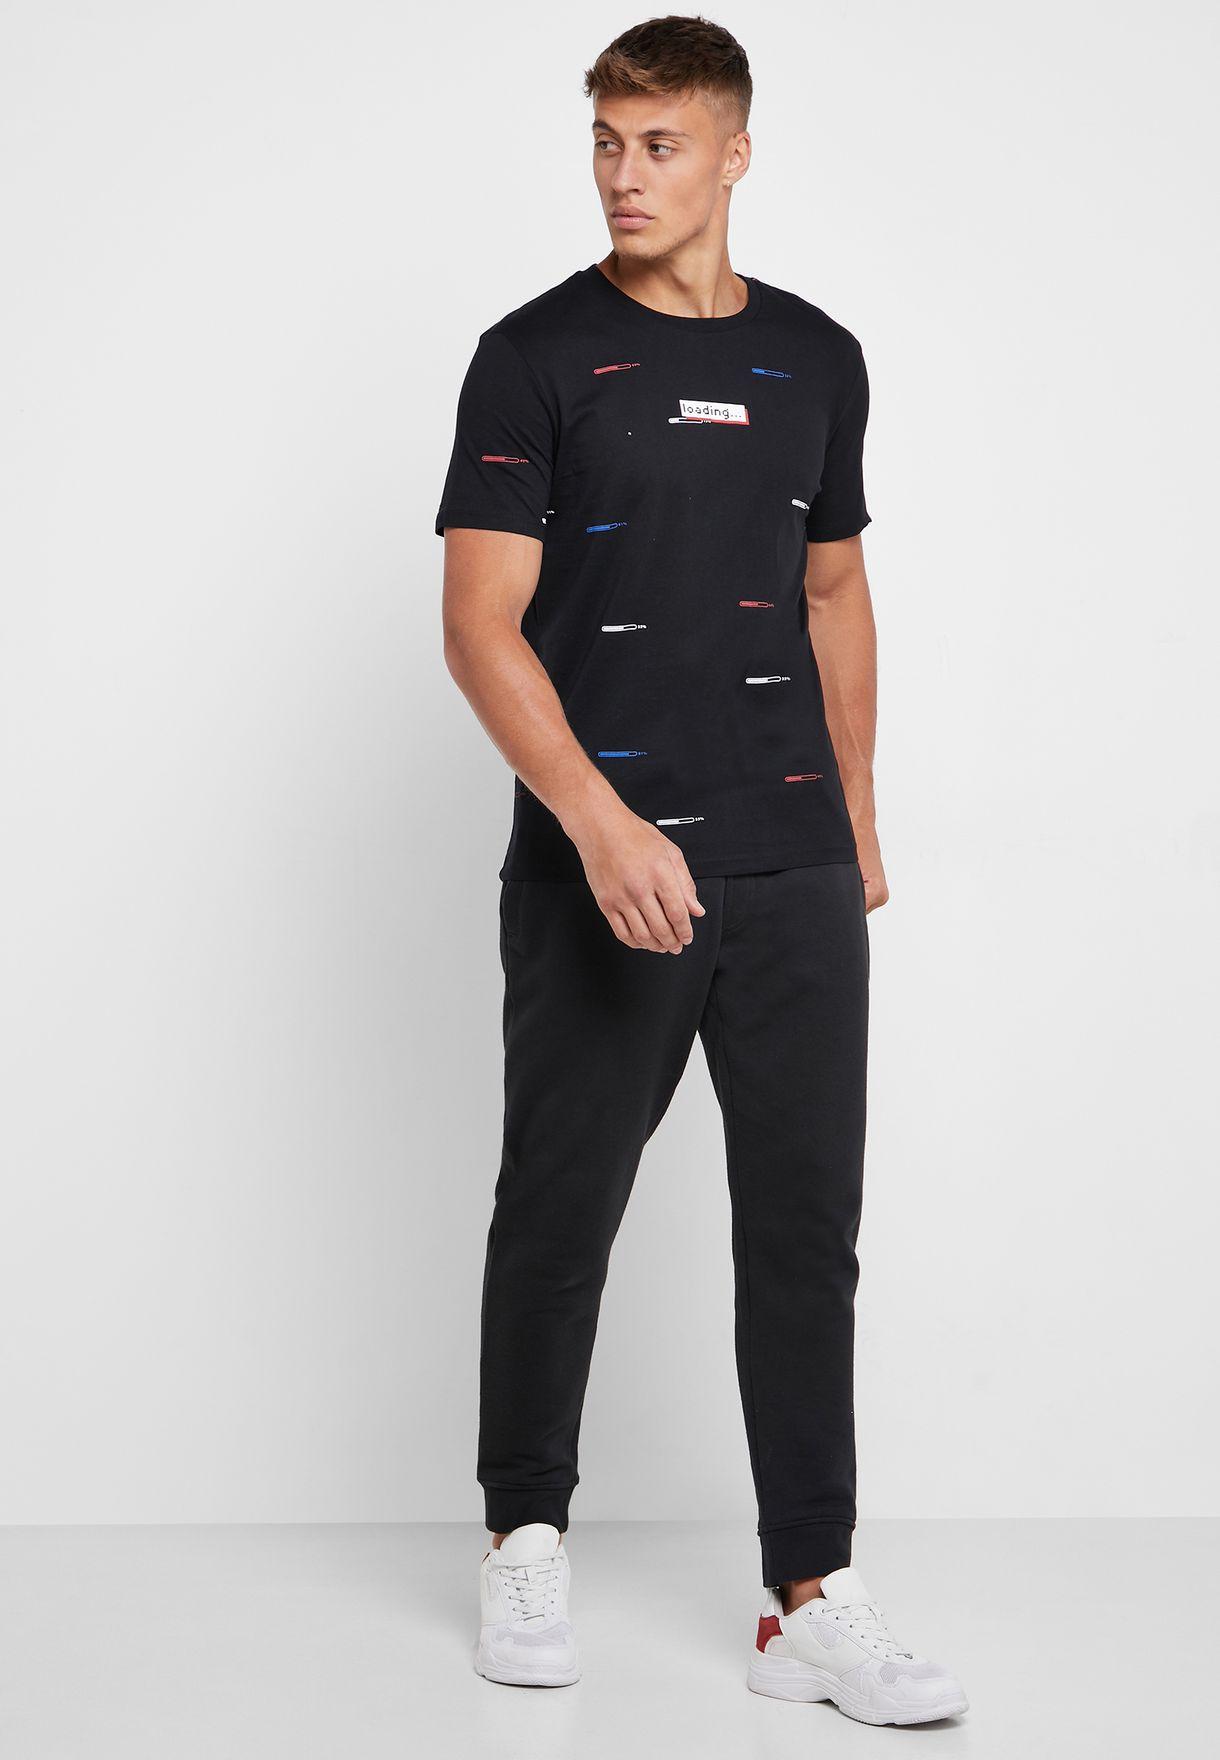 AOP Crew Neck T-Shirt